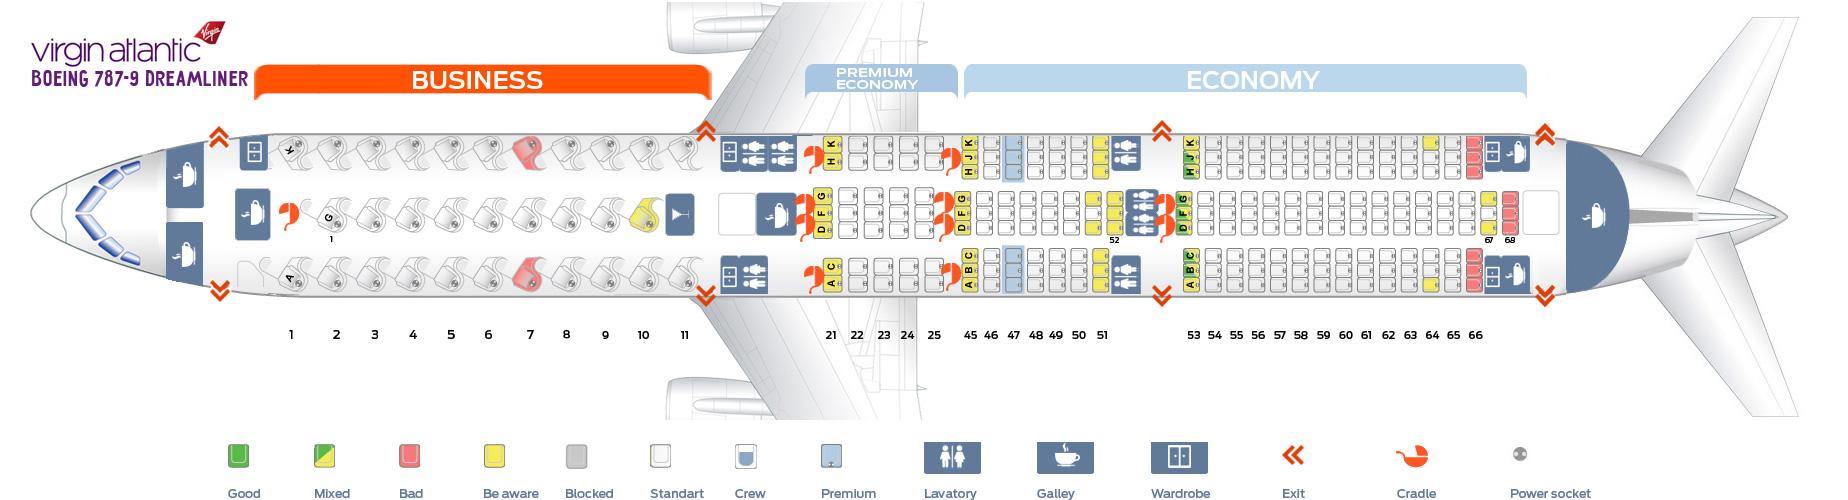 Seat Map Boeing 787-9 Dreaminer Virgin Atlantic